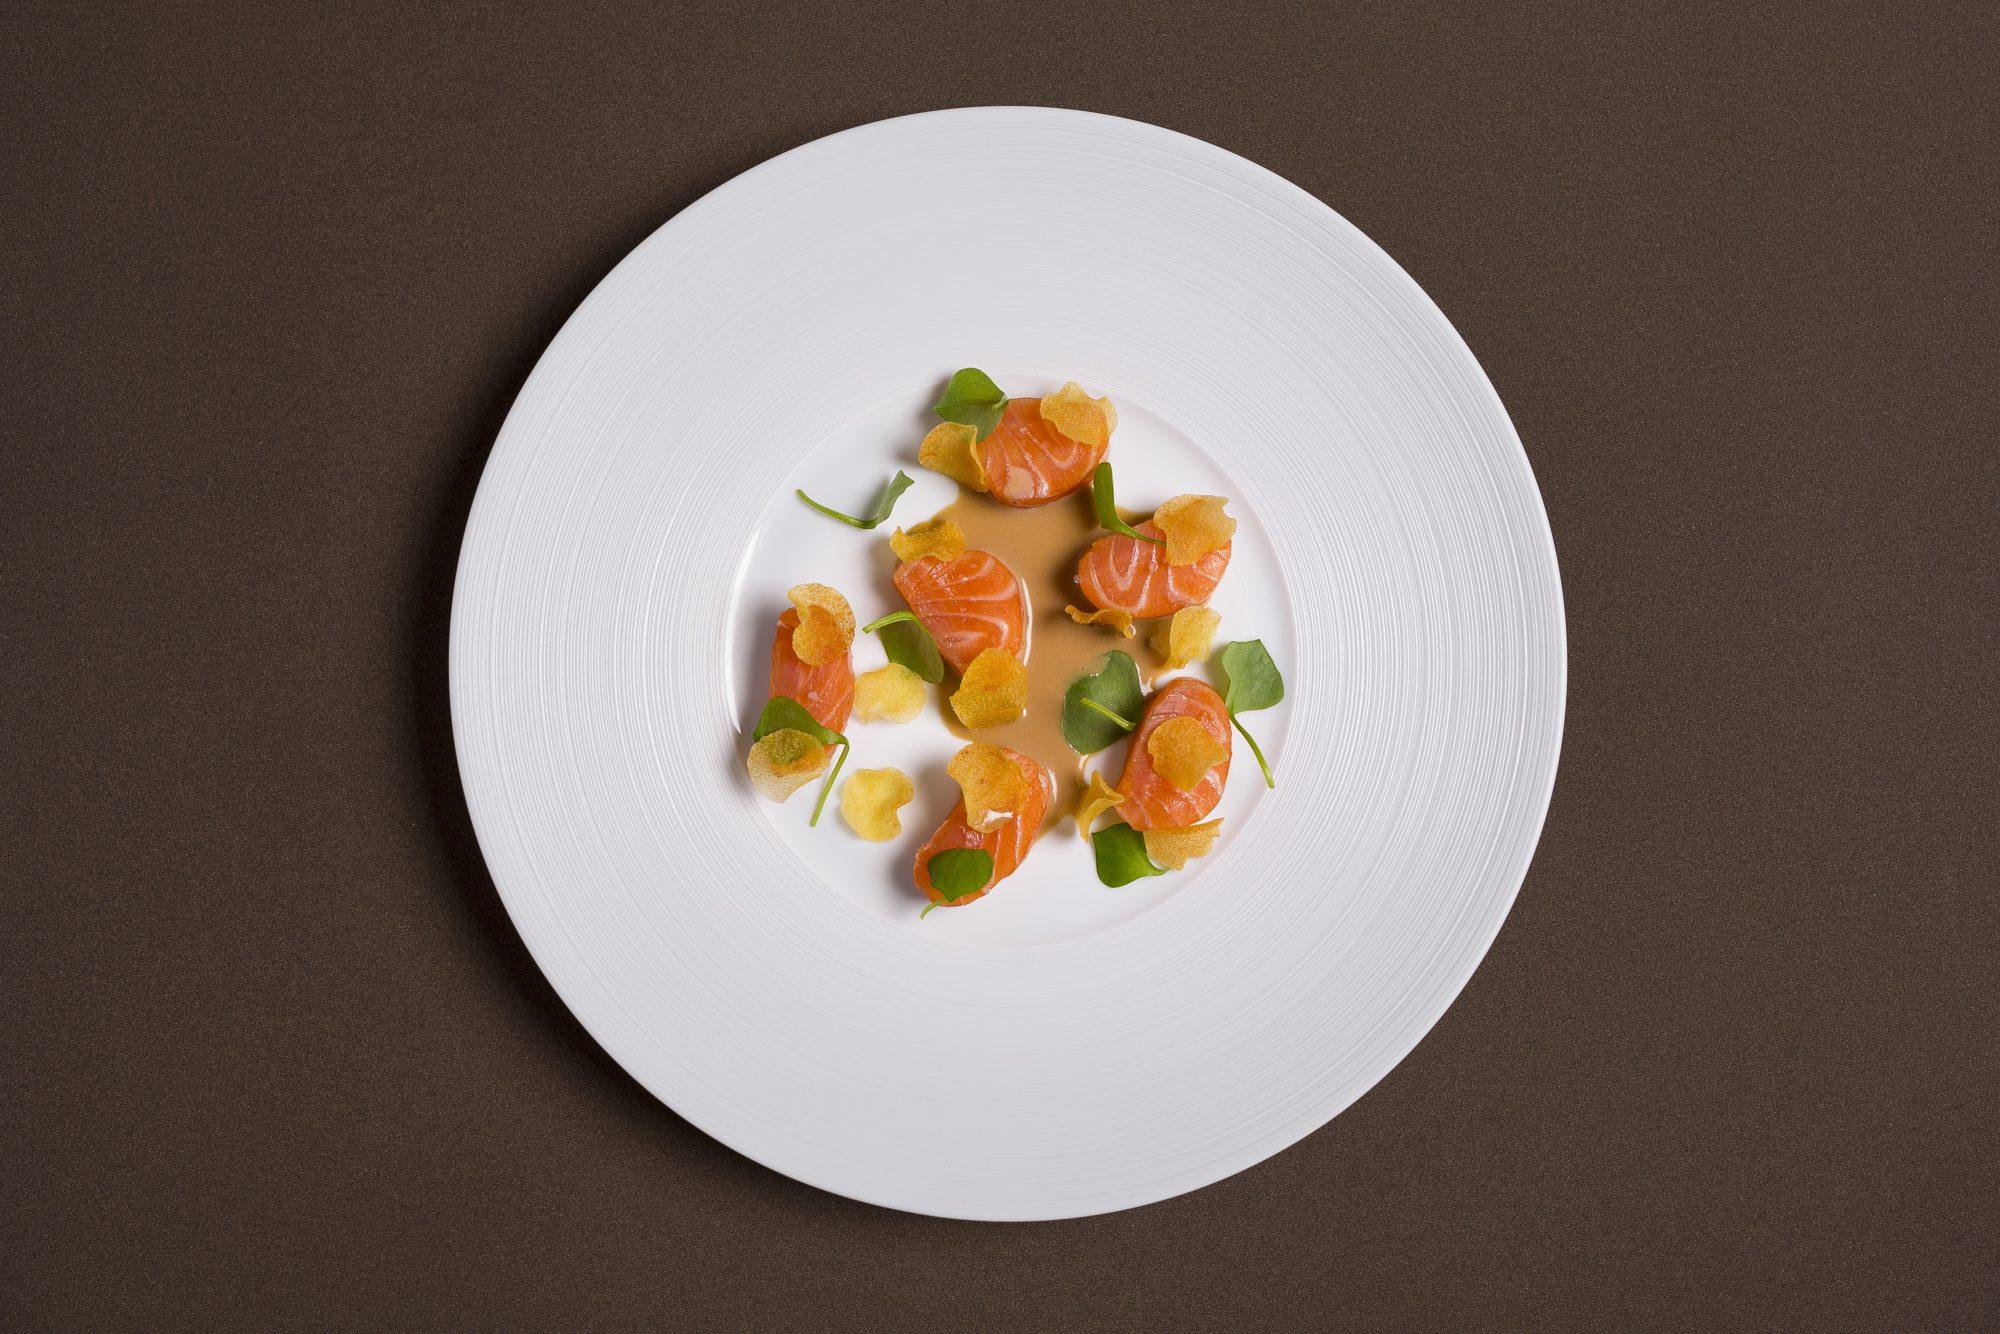 files-recipes-chefs-sombardier-large-NN_0543_Hdef-enn2004